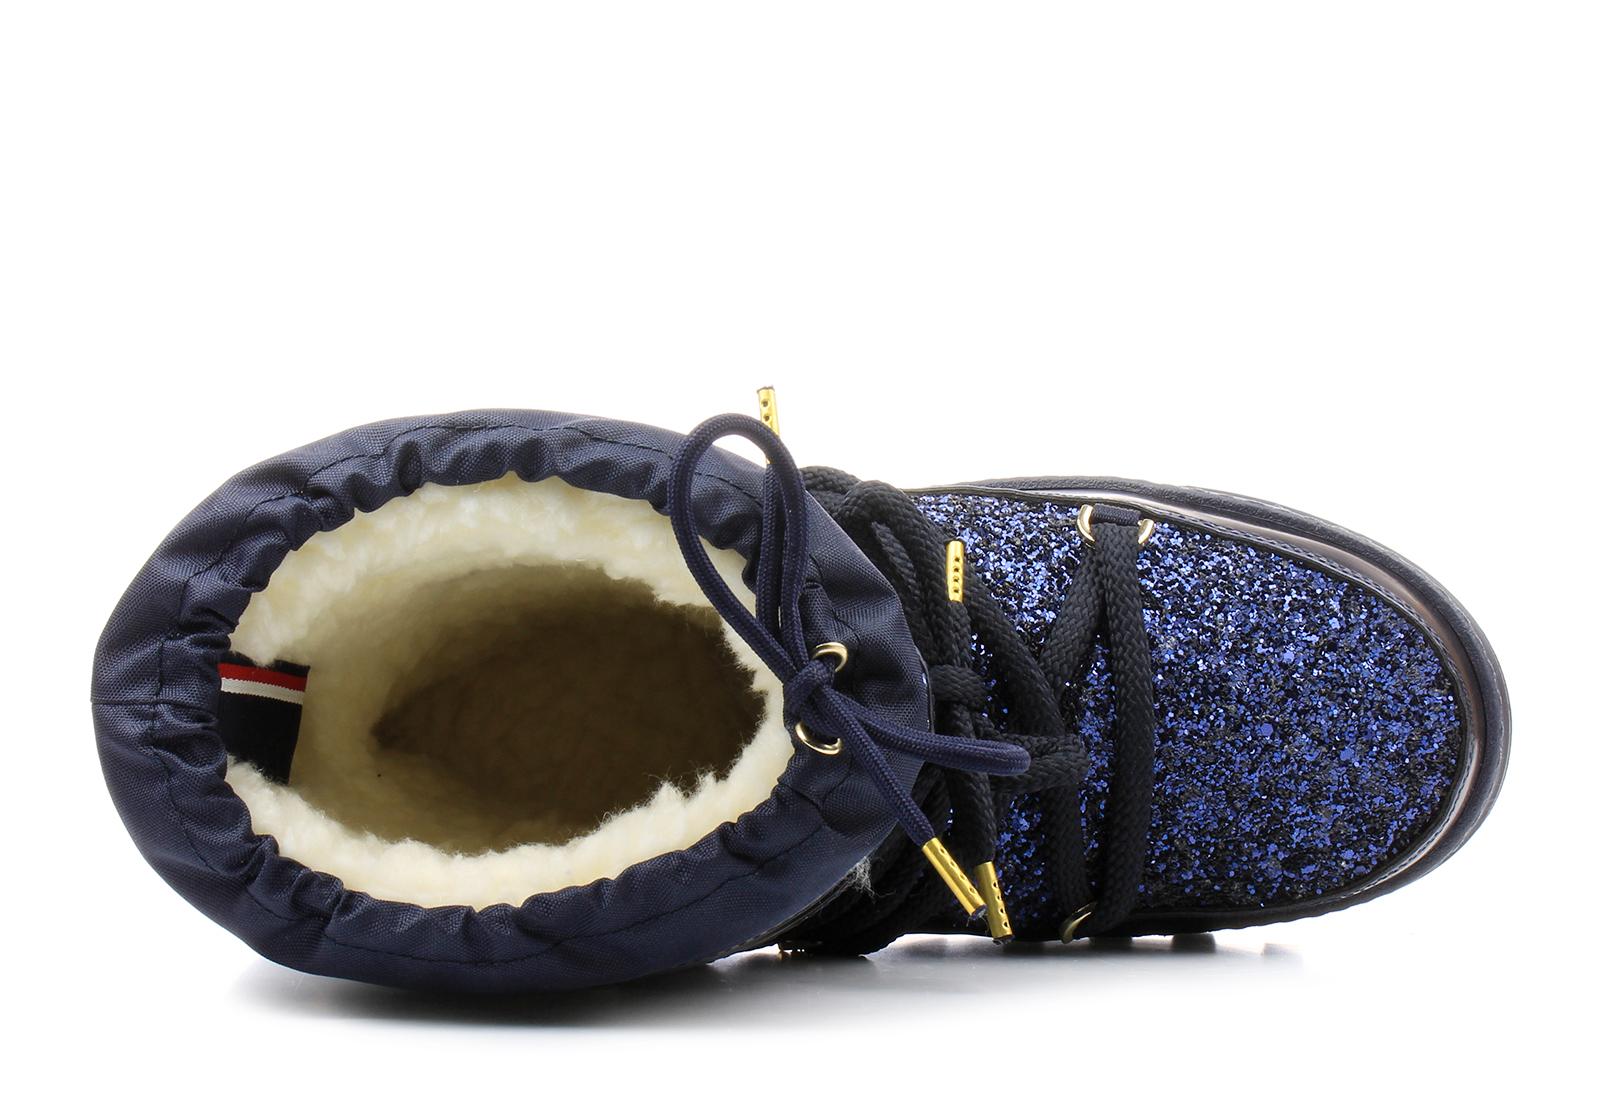 0917e255b Tommy Hilfiger Boots - Wanda 7c - 17F-2029-403 - Online shop for ...